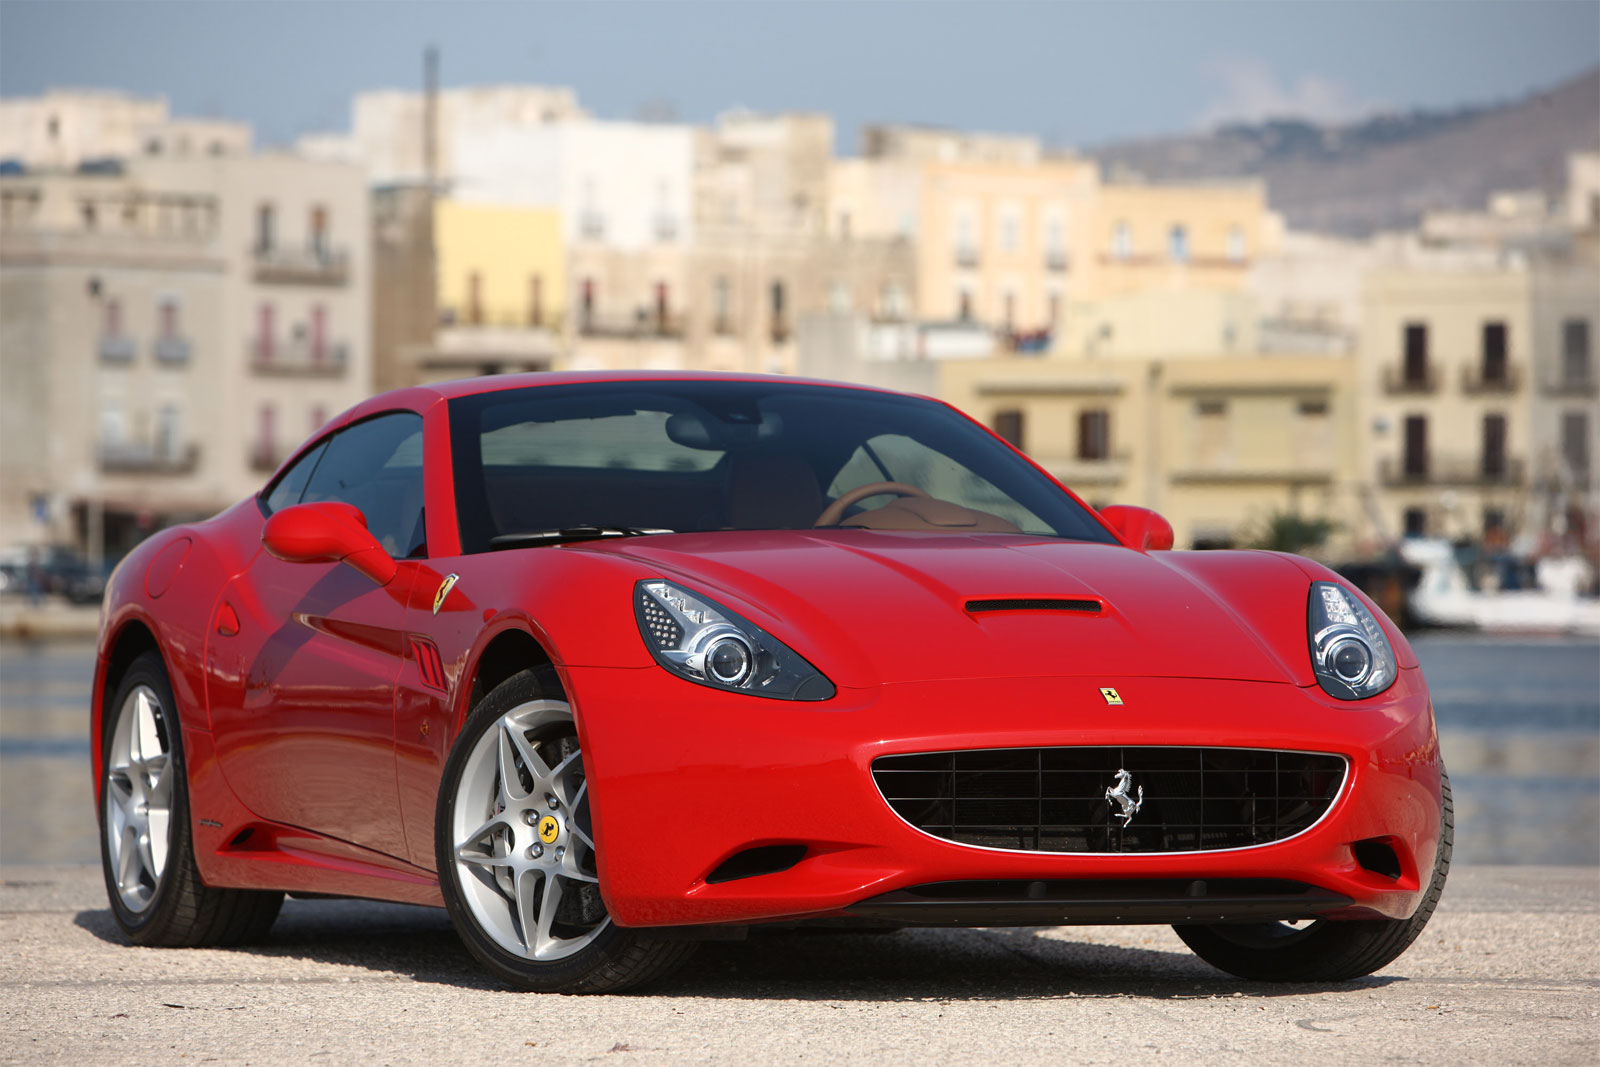 Sports Car Collection: 2011 Ferrari California Photo Gallery